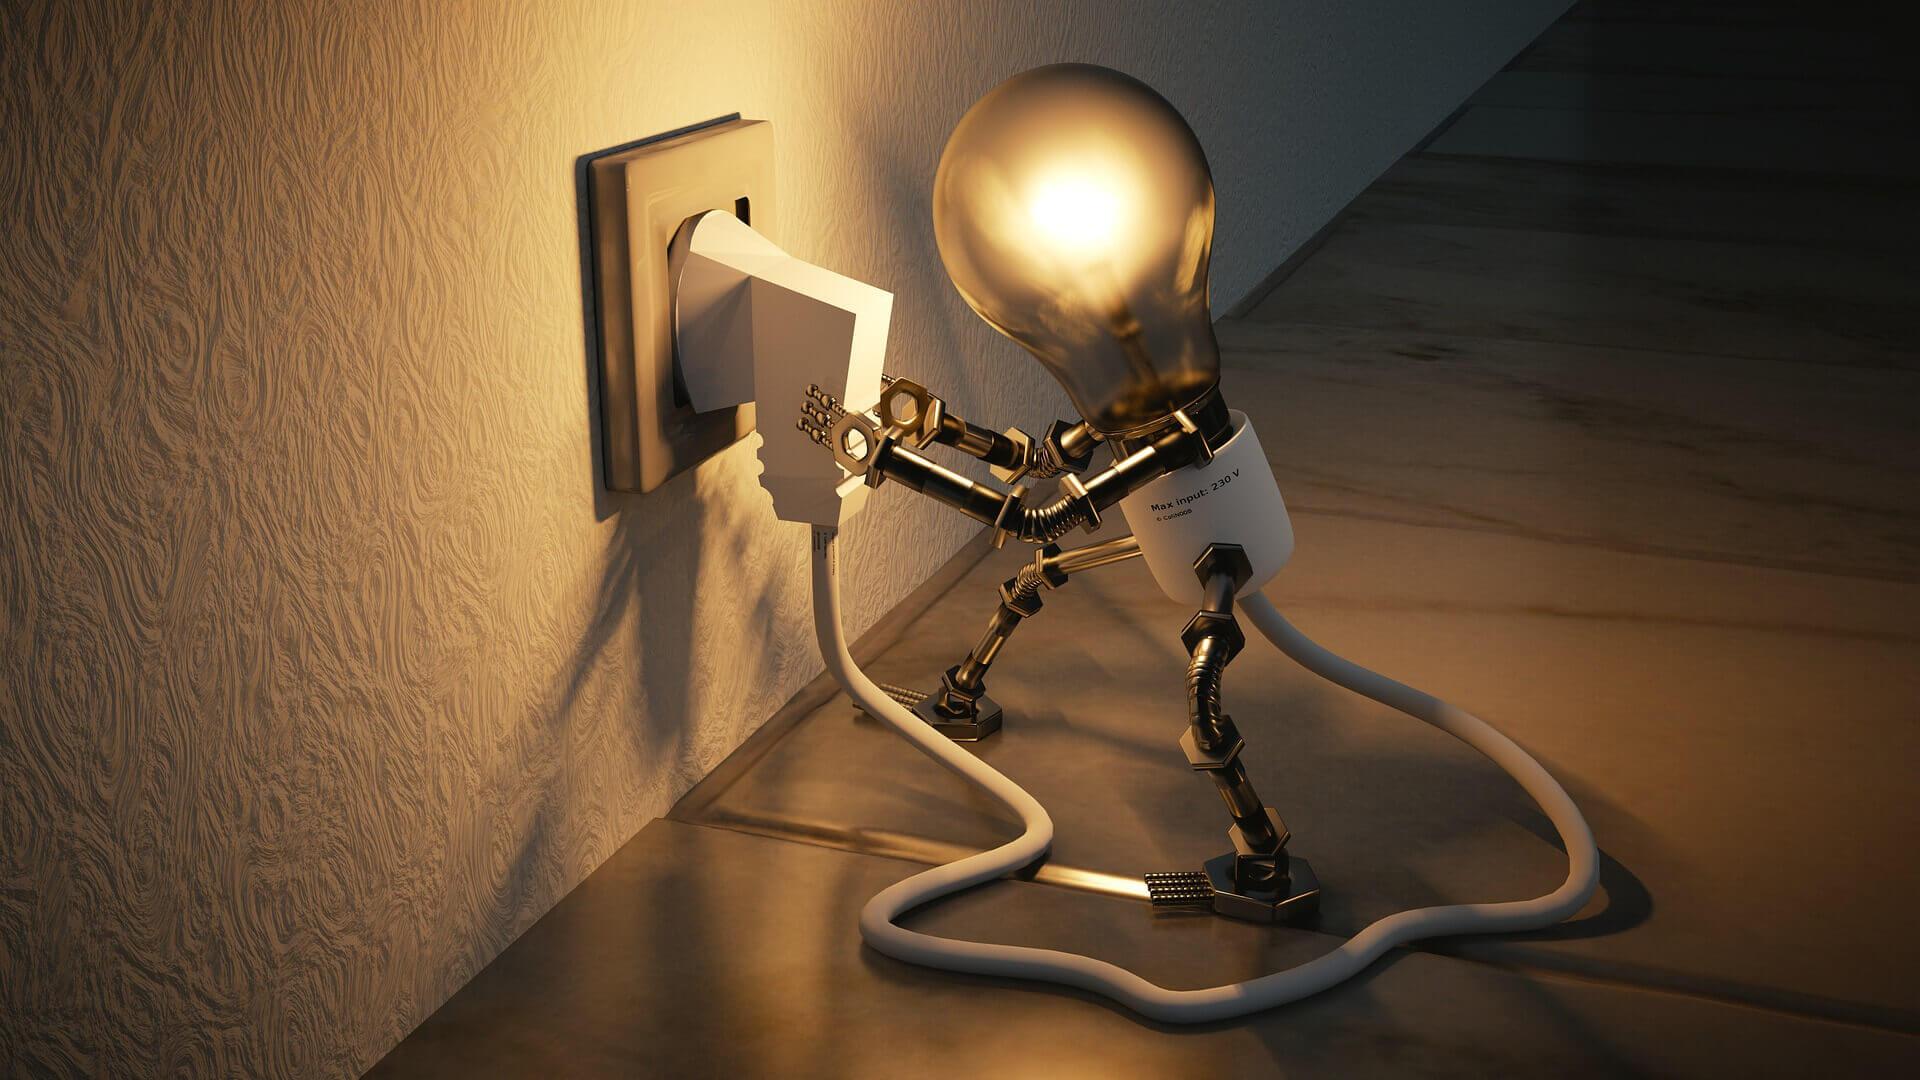 Inteligent Light Bulb